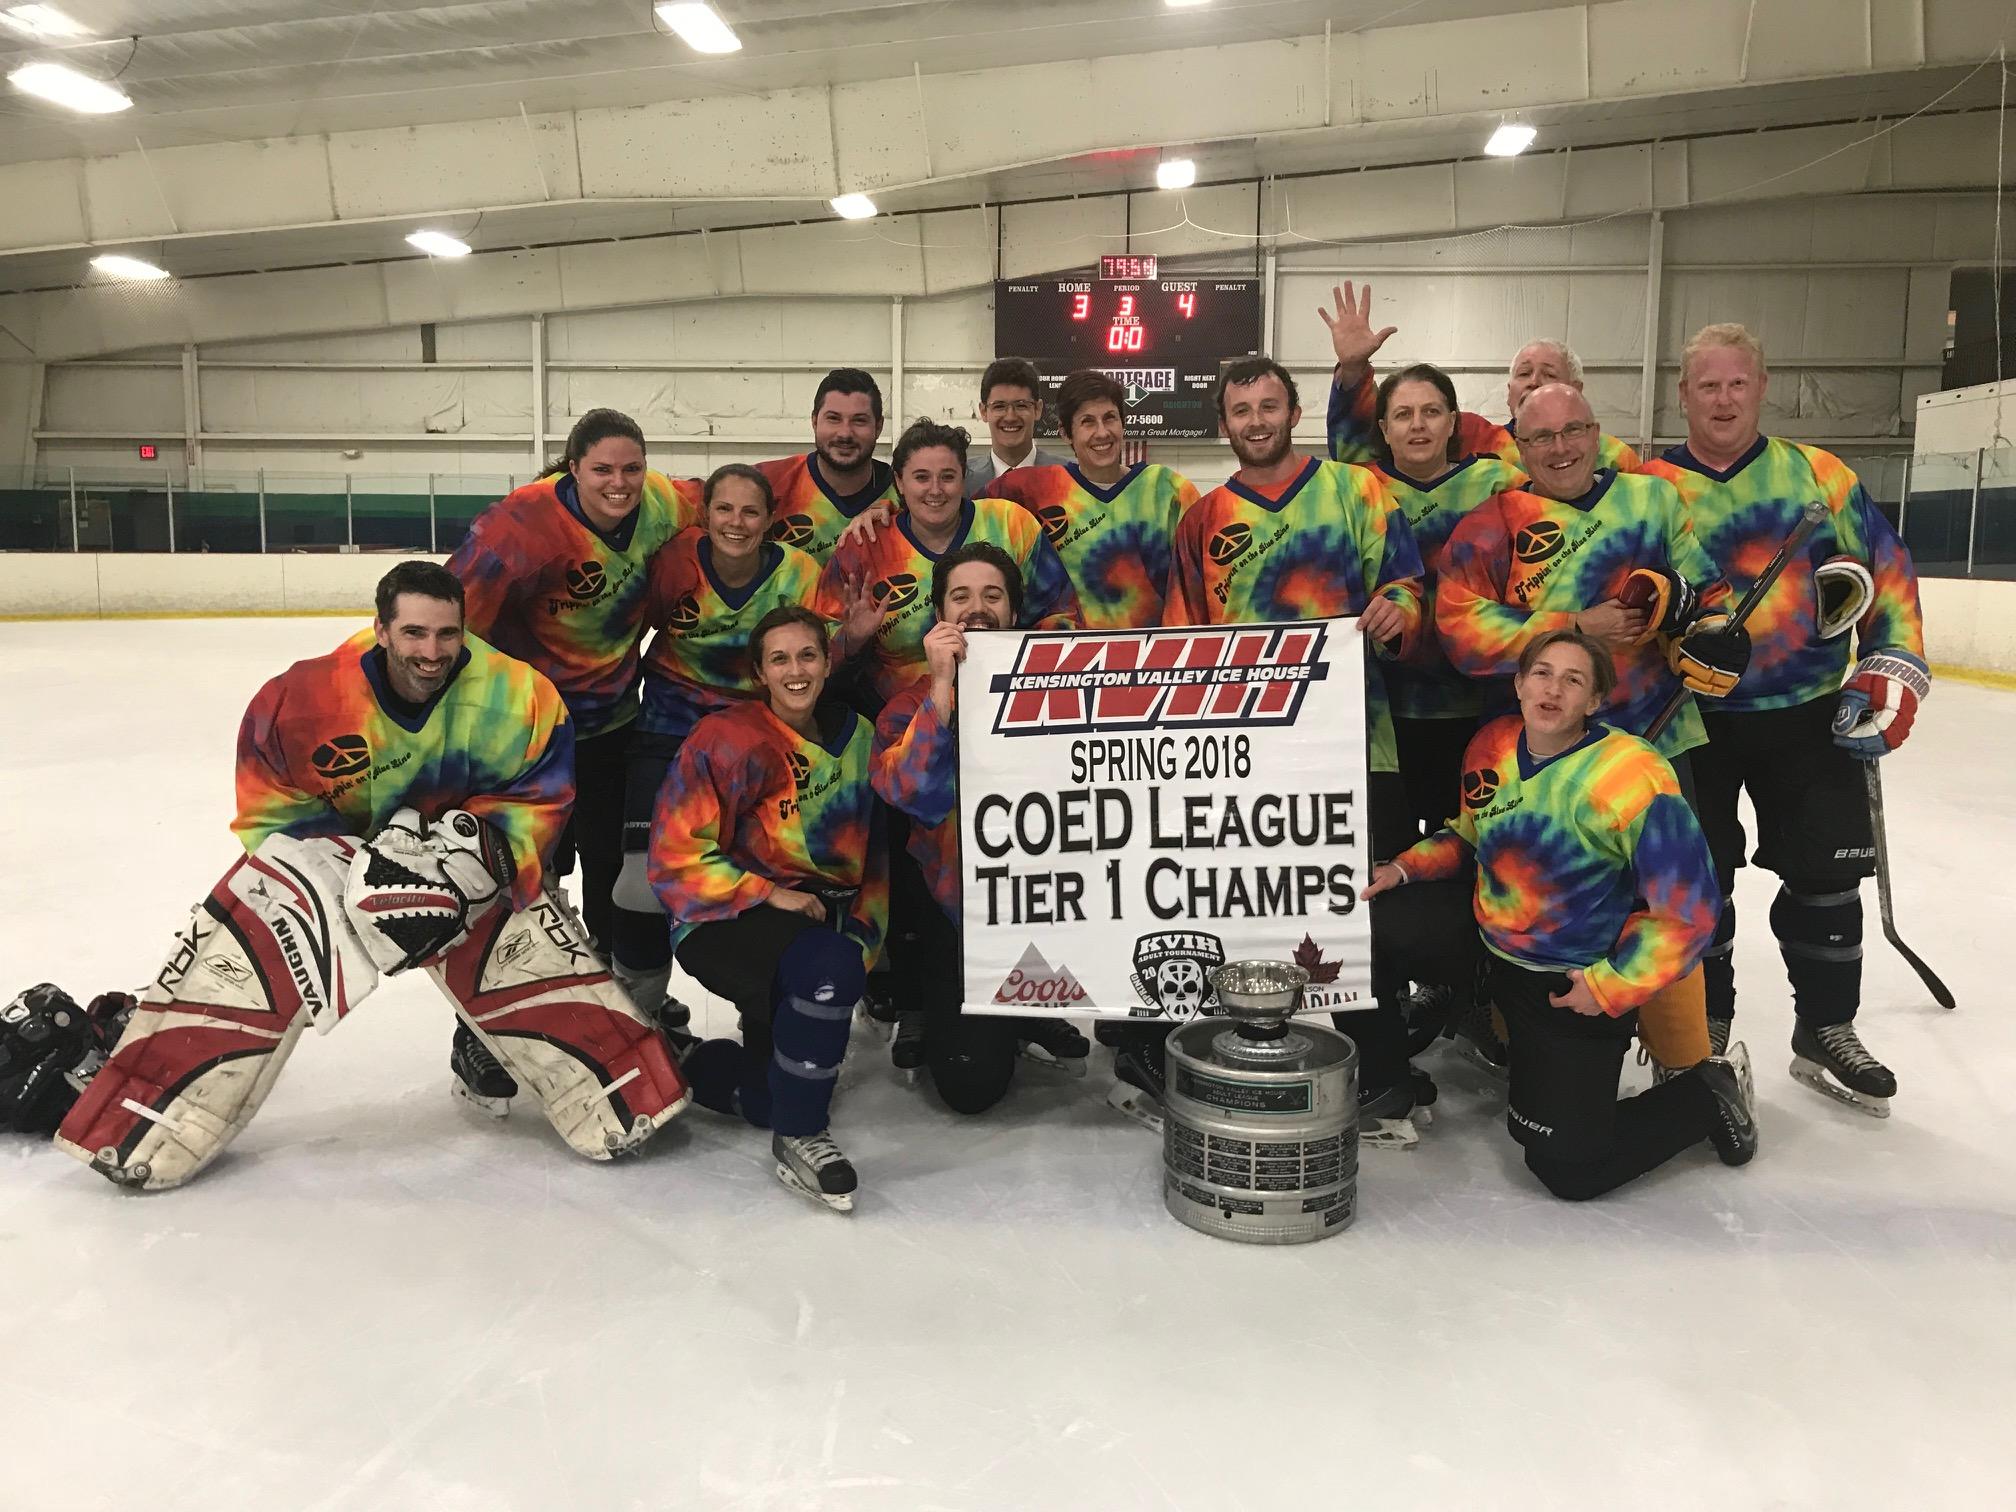 Coed 2018 league champs